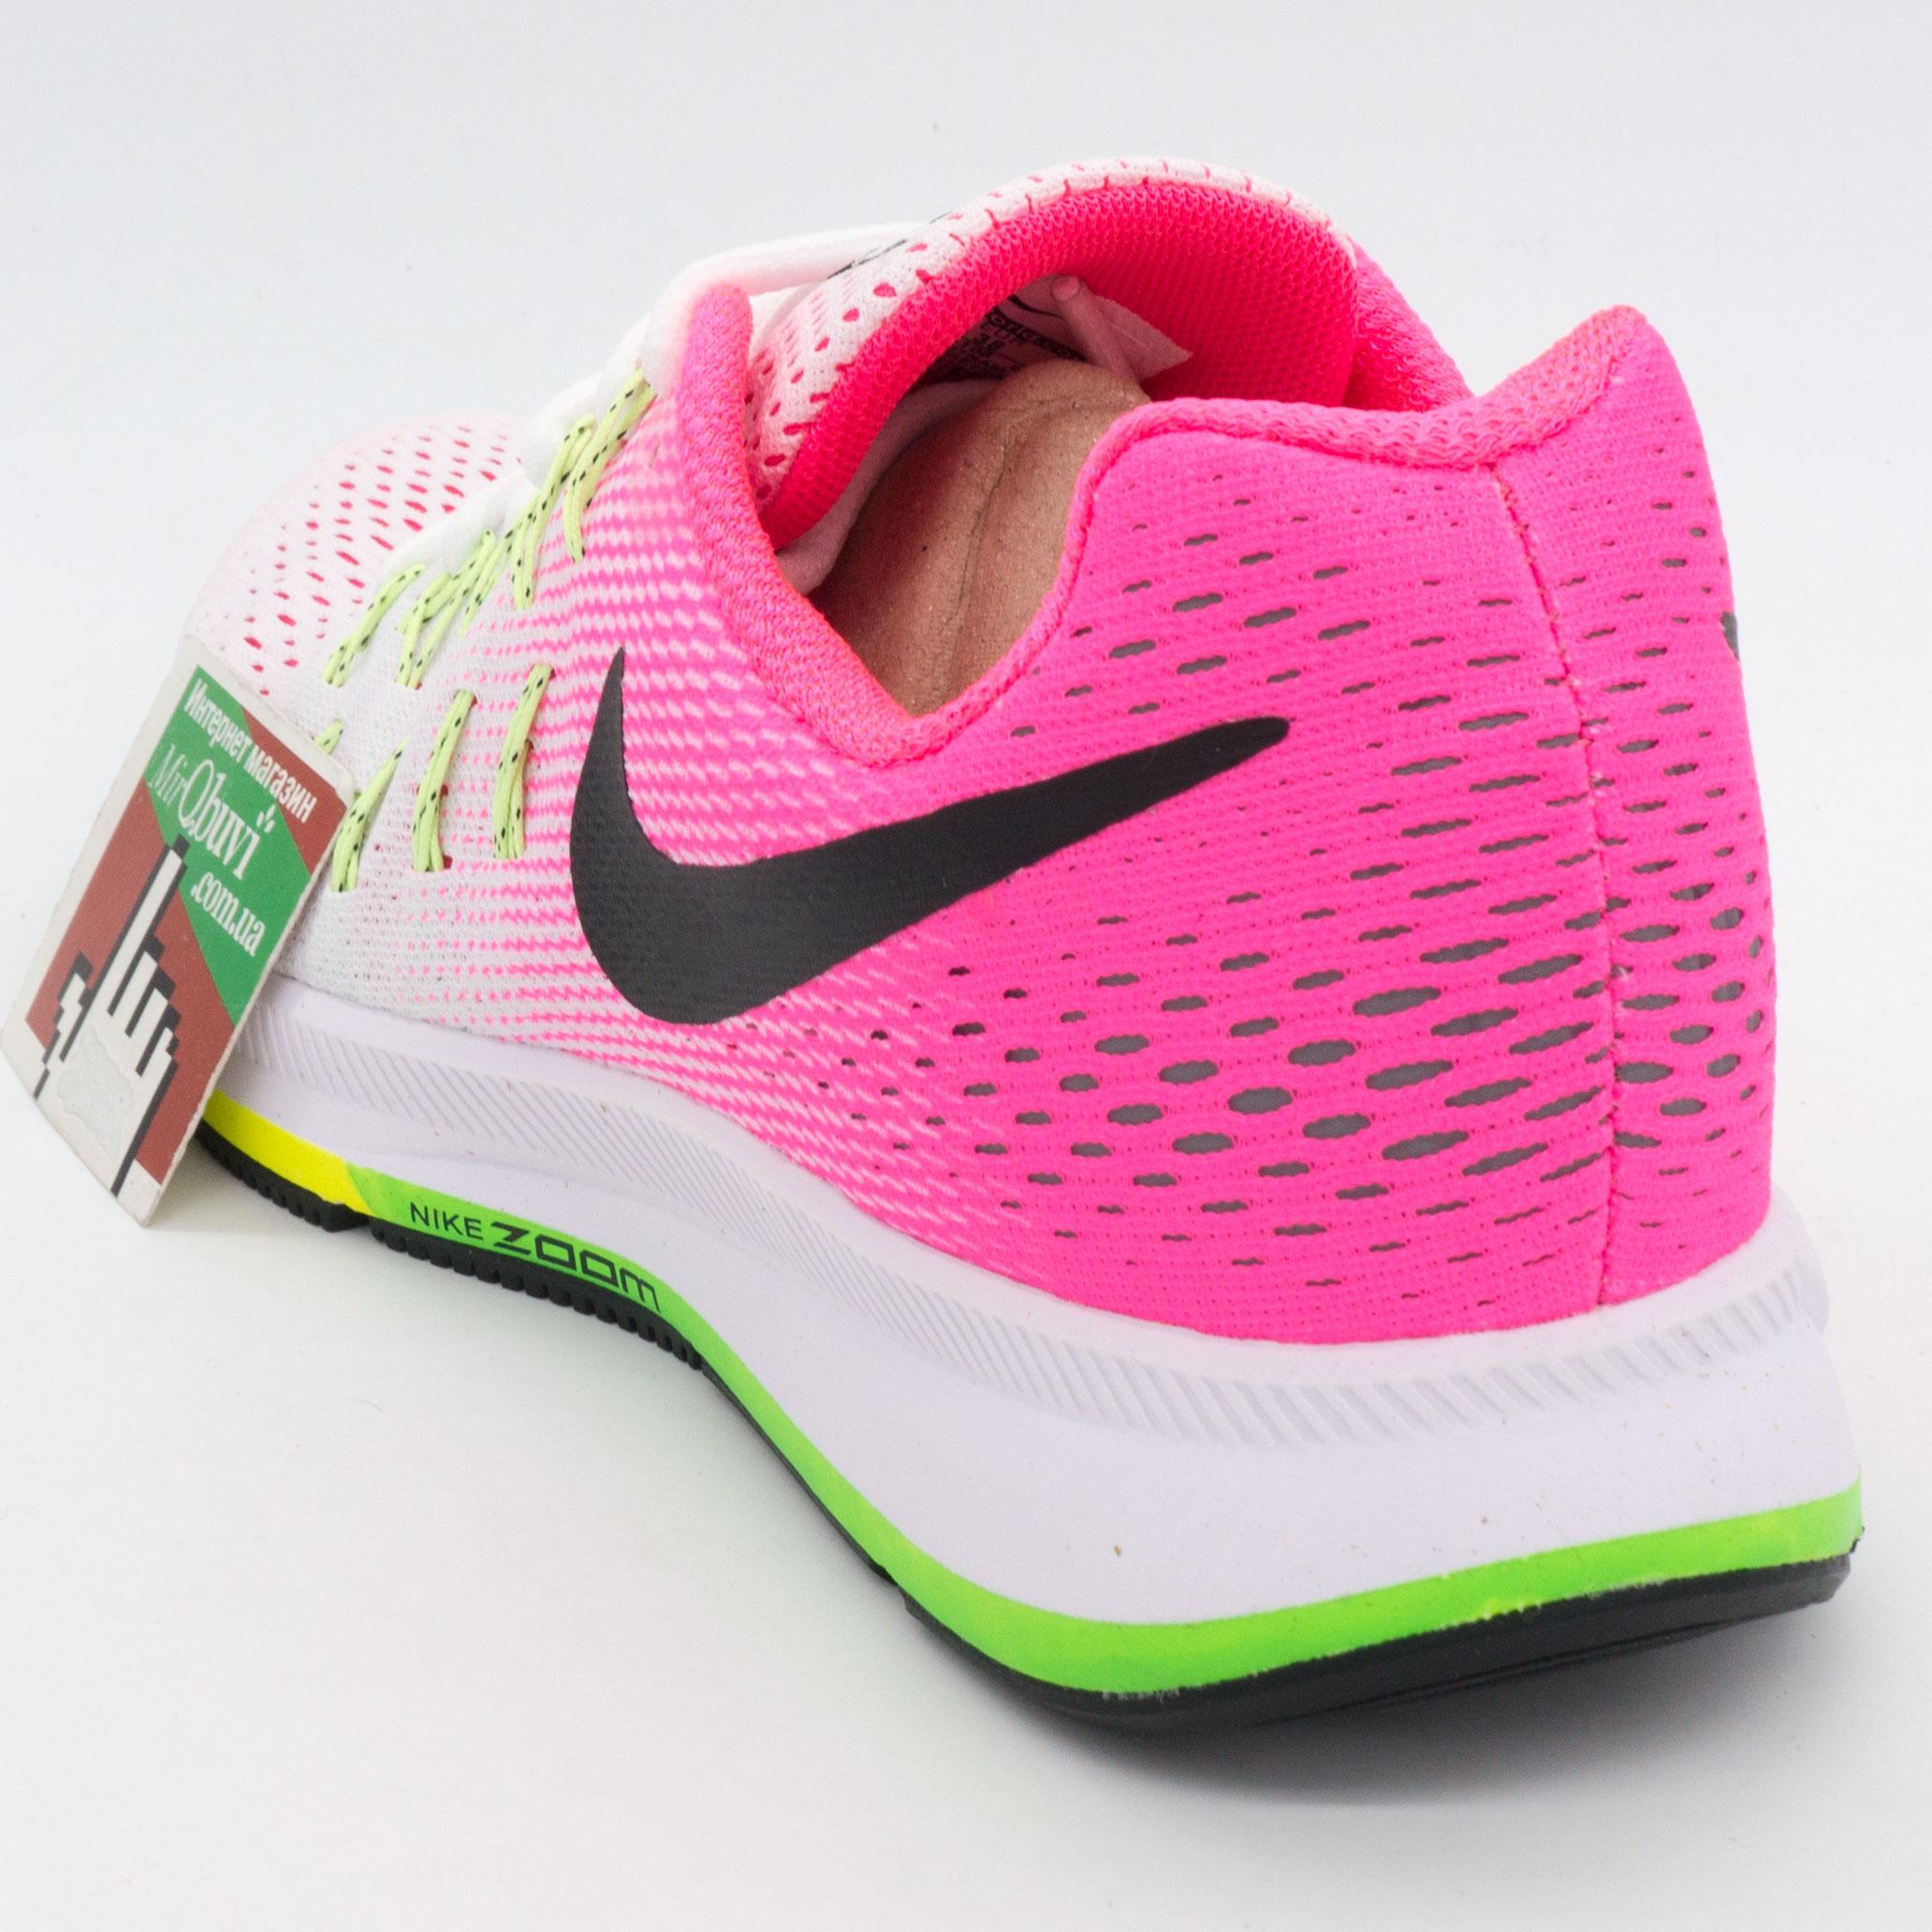 фото back Женские кроссовки для бега Nike Zoom Pegasus 33 светло-розовые. Топ качество! back